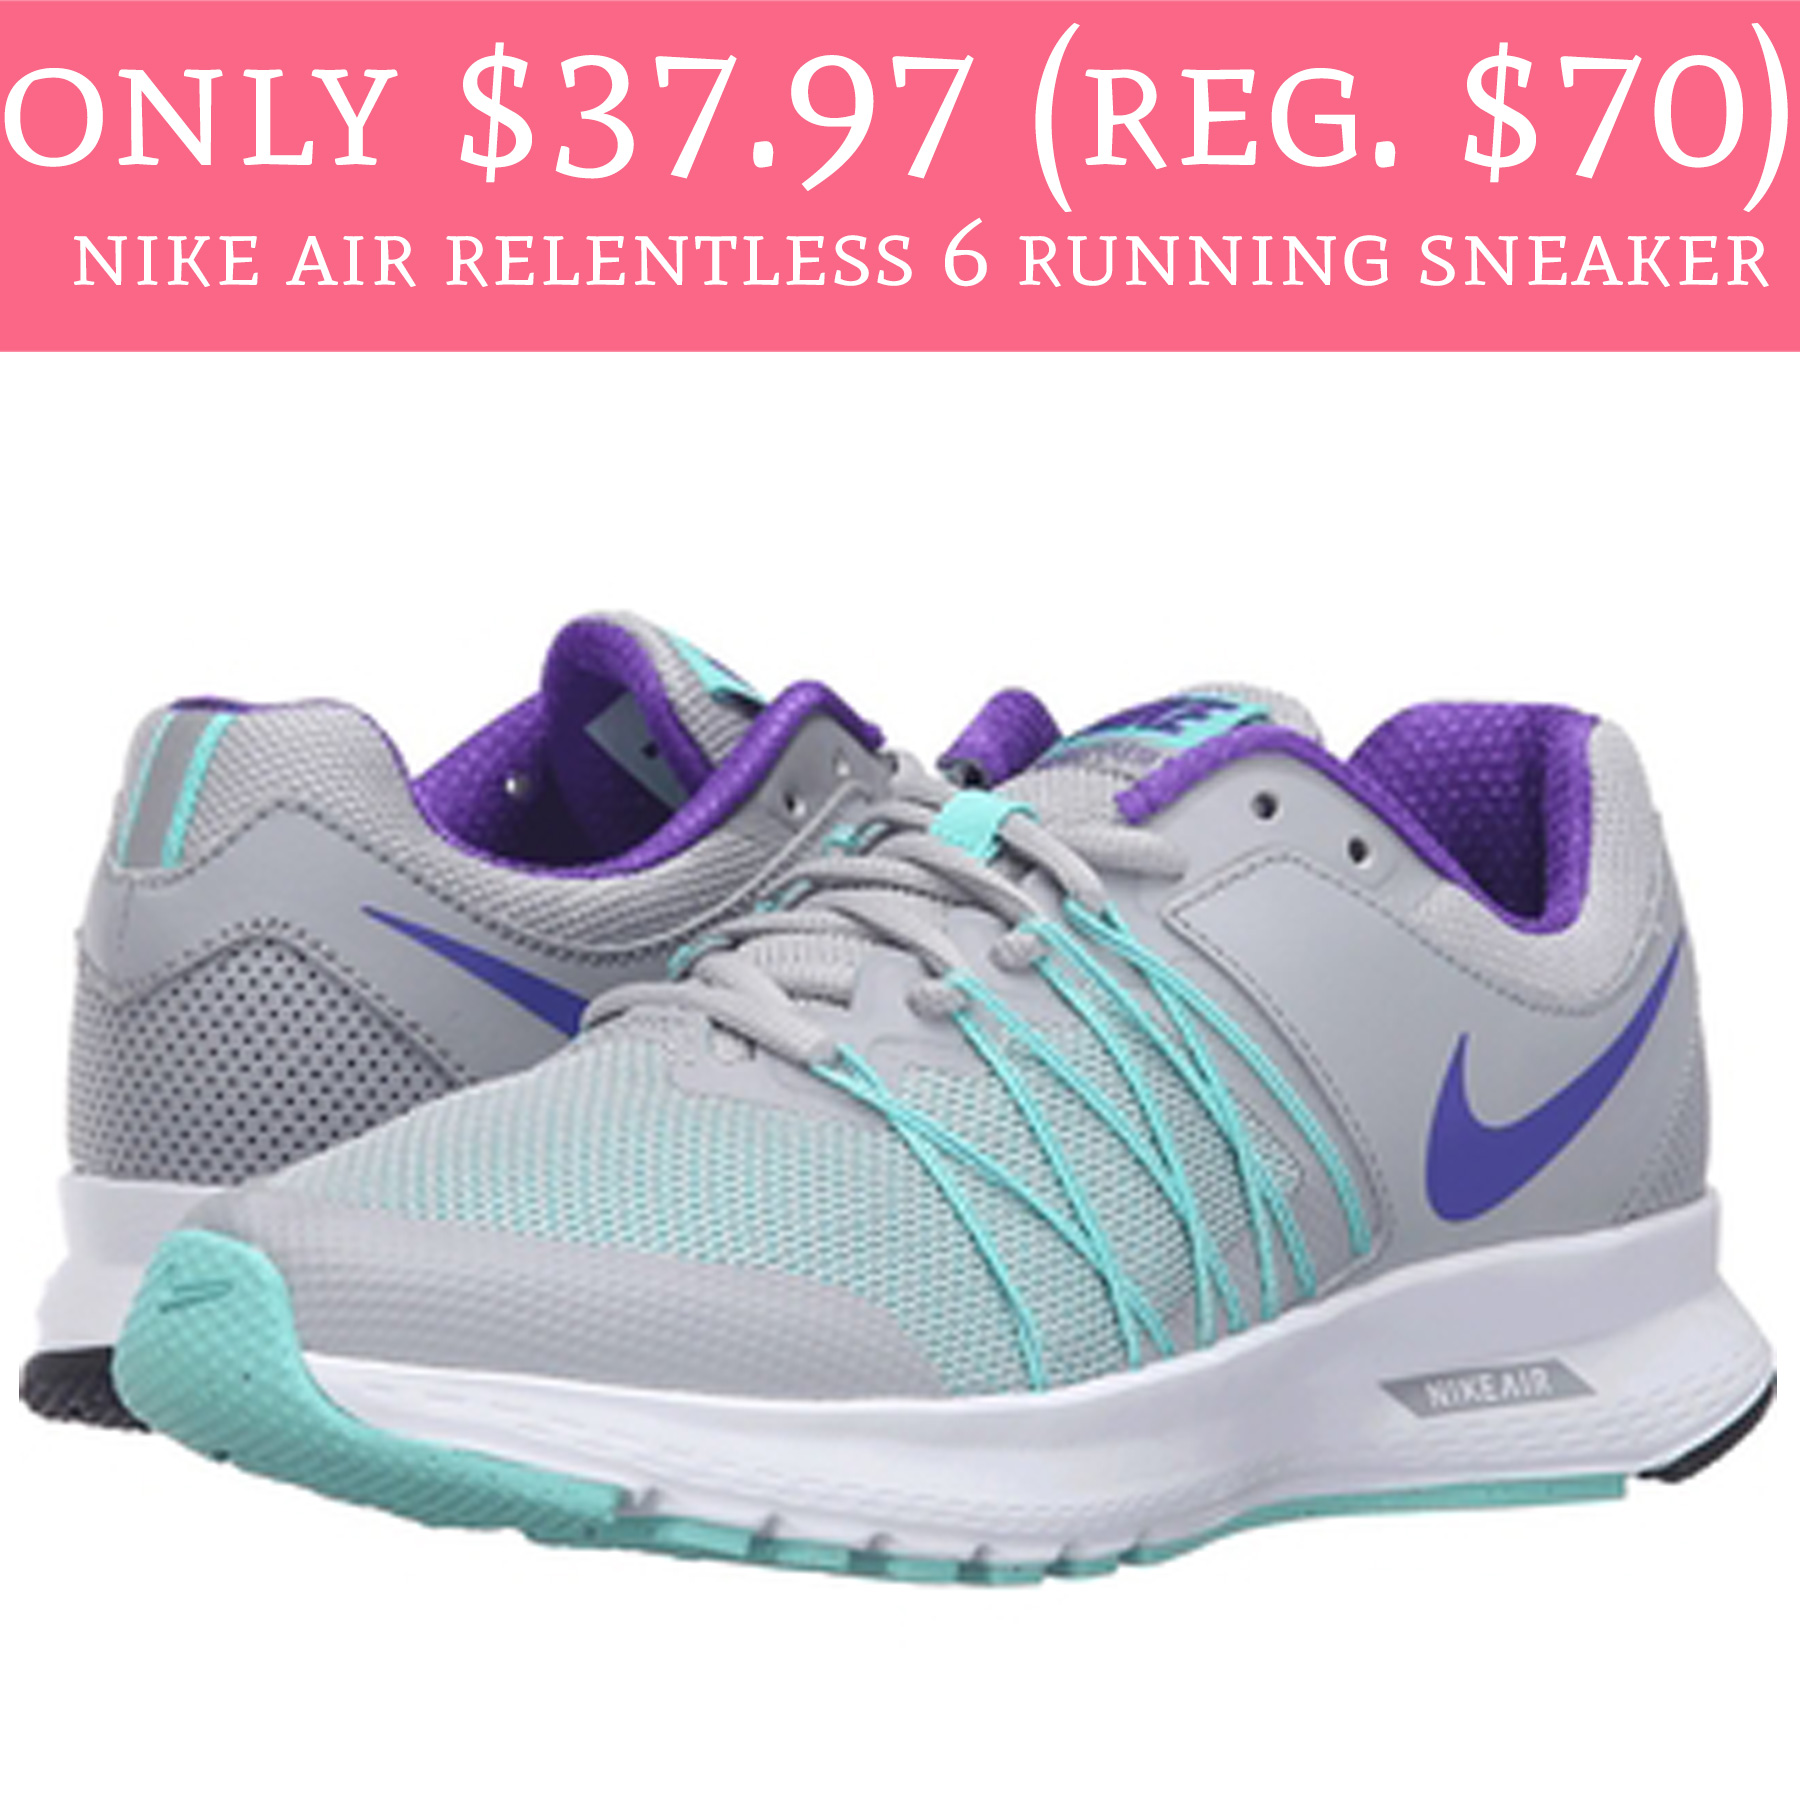 official photos 6a044 7ae37 Only $37.97 (Regular $70) Nike Air Relentless 6 Running ...